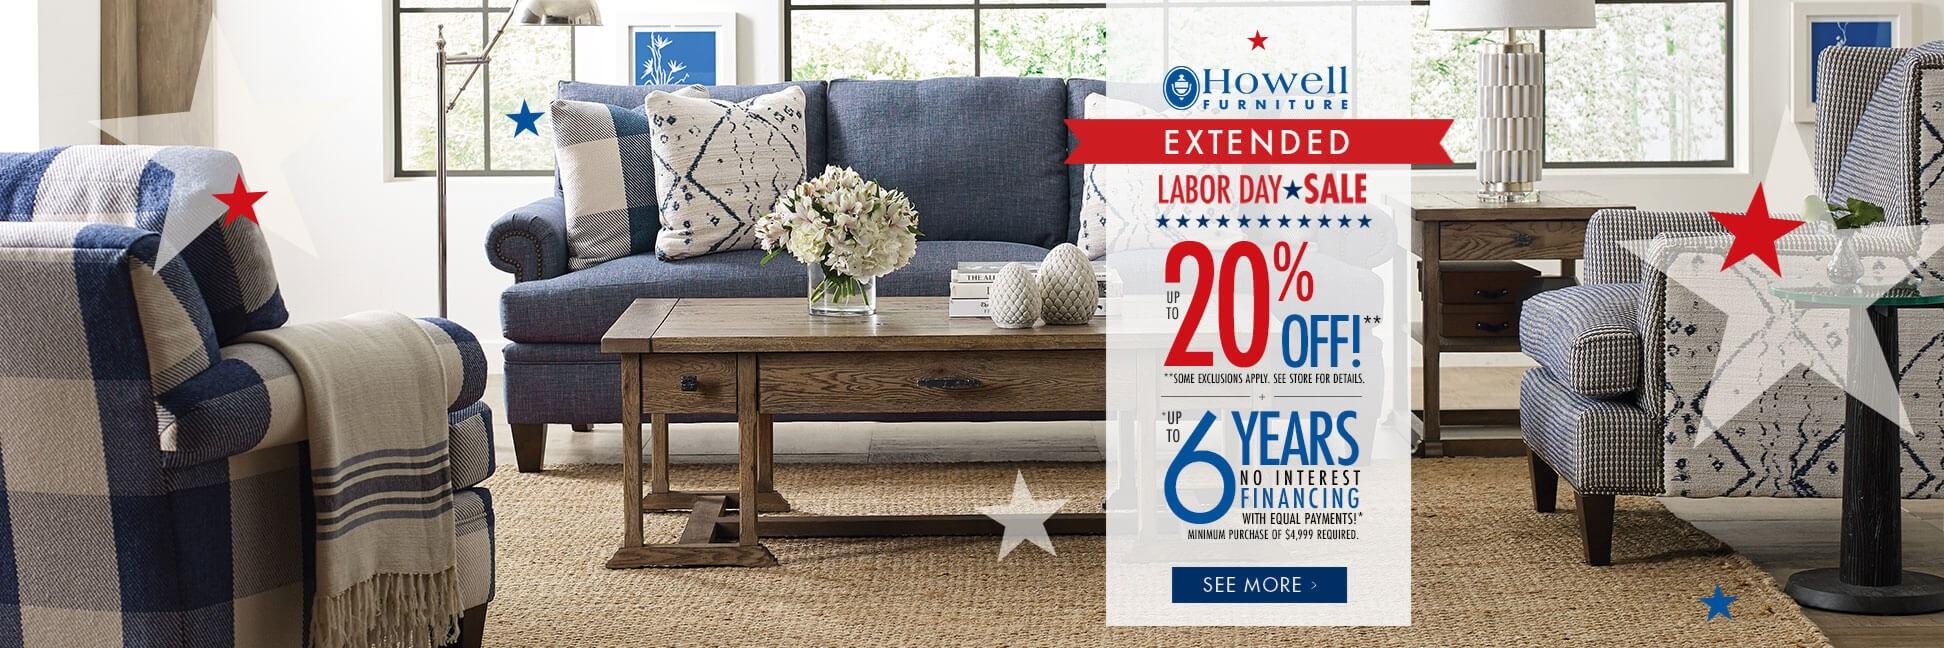 Howell Furniture | Beaumont, Port Arthur, Lake Charles